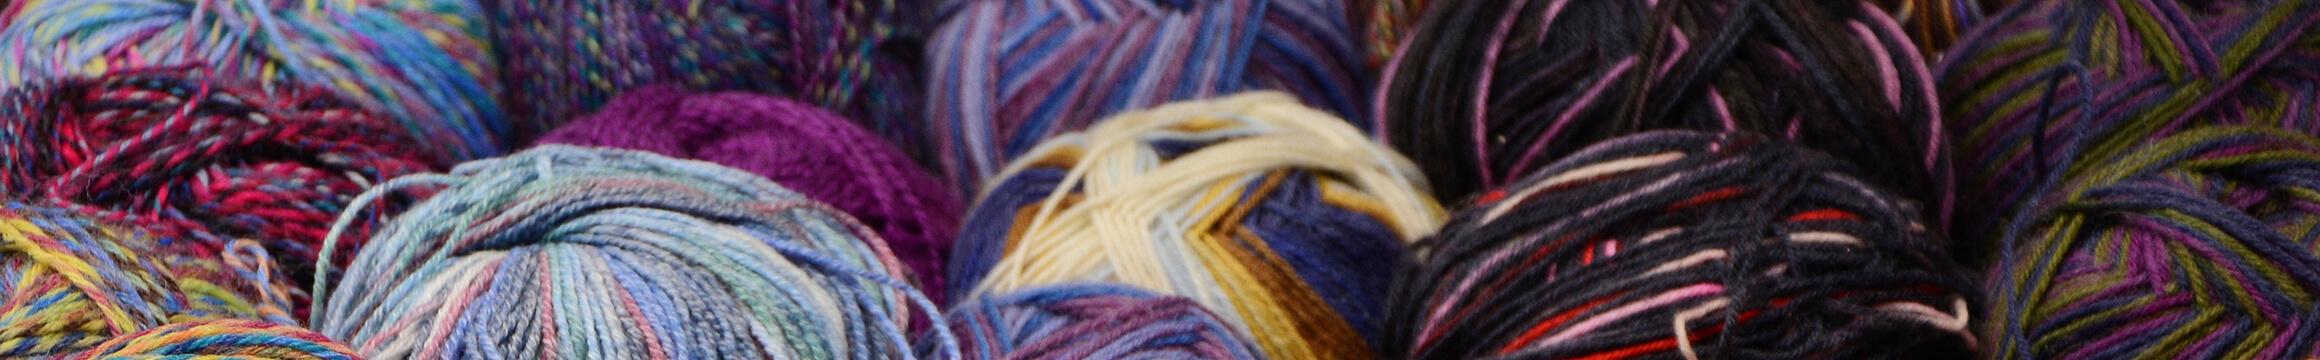 Yarn 08